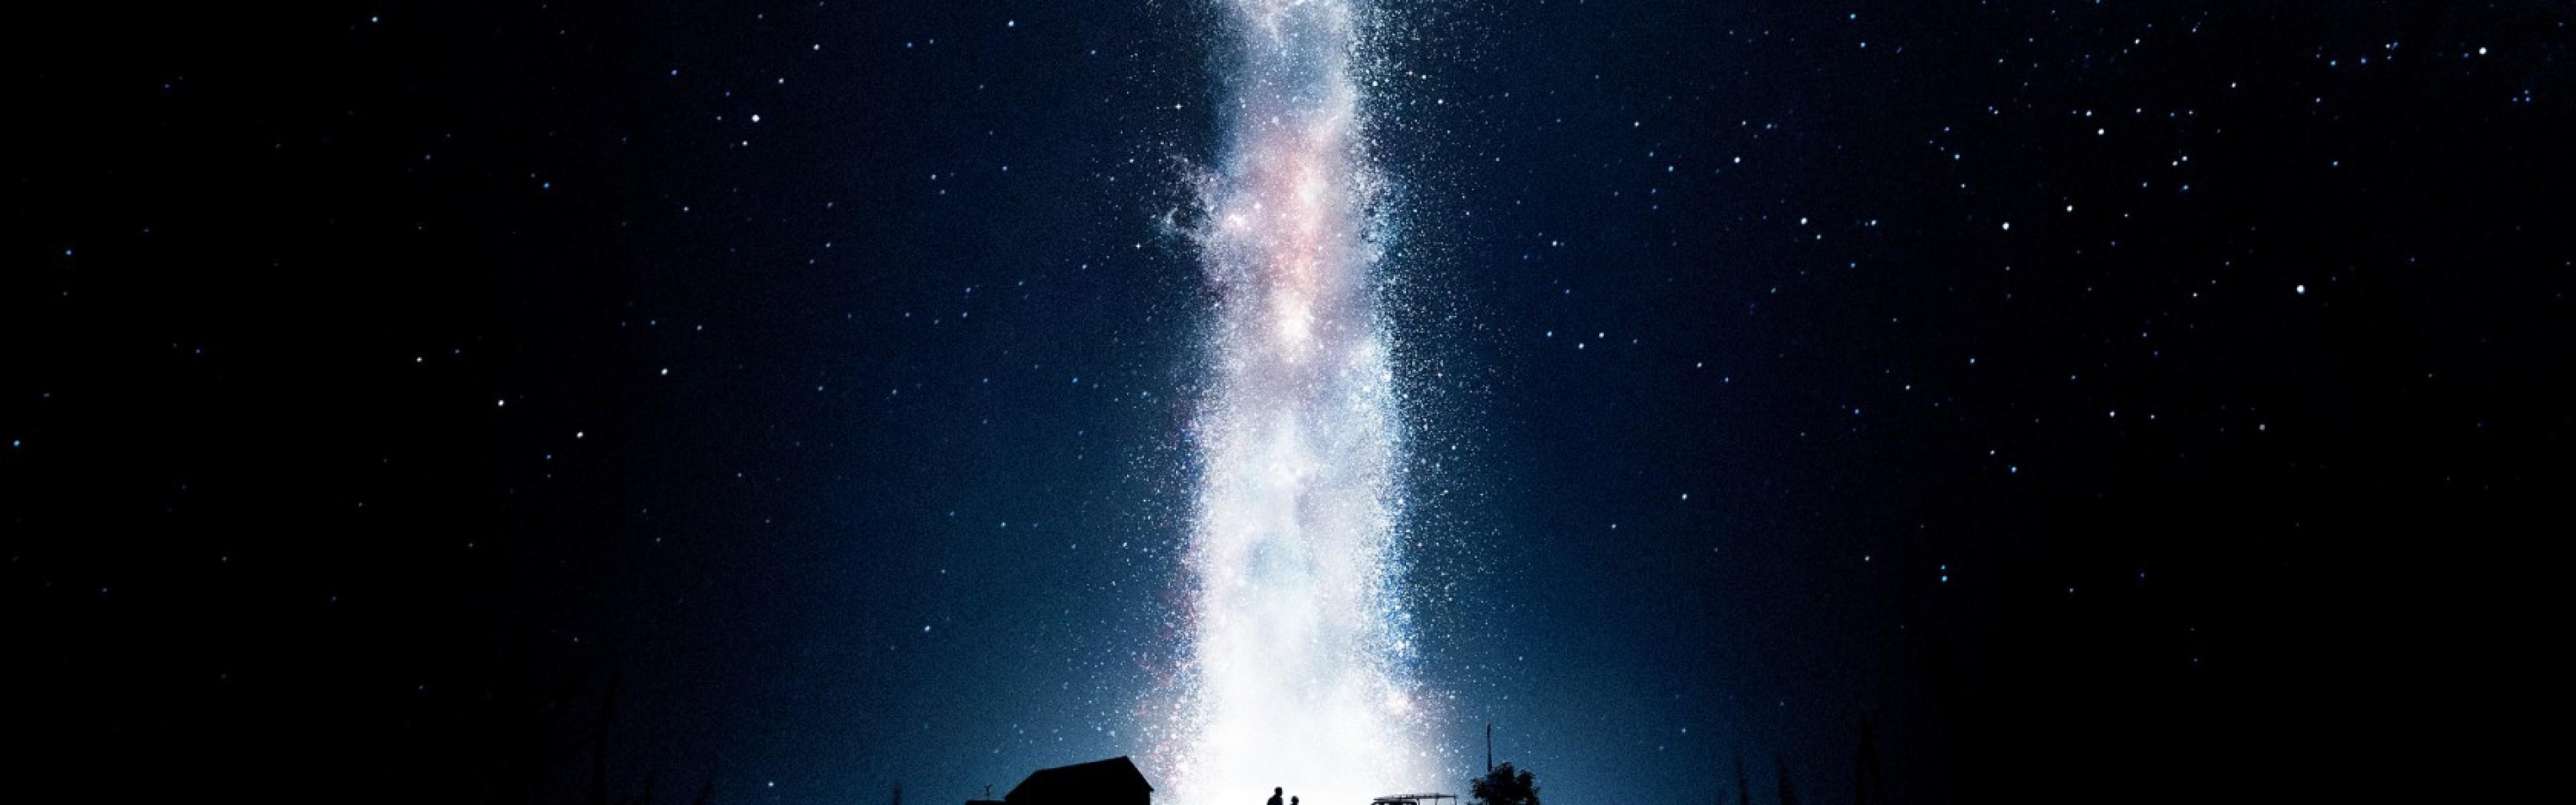 Preview Wallpaper Interstellar, 2014, Matthew Mcconaughey, Movie, Usa, Uk  3840×1200